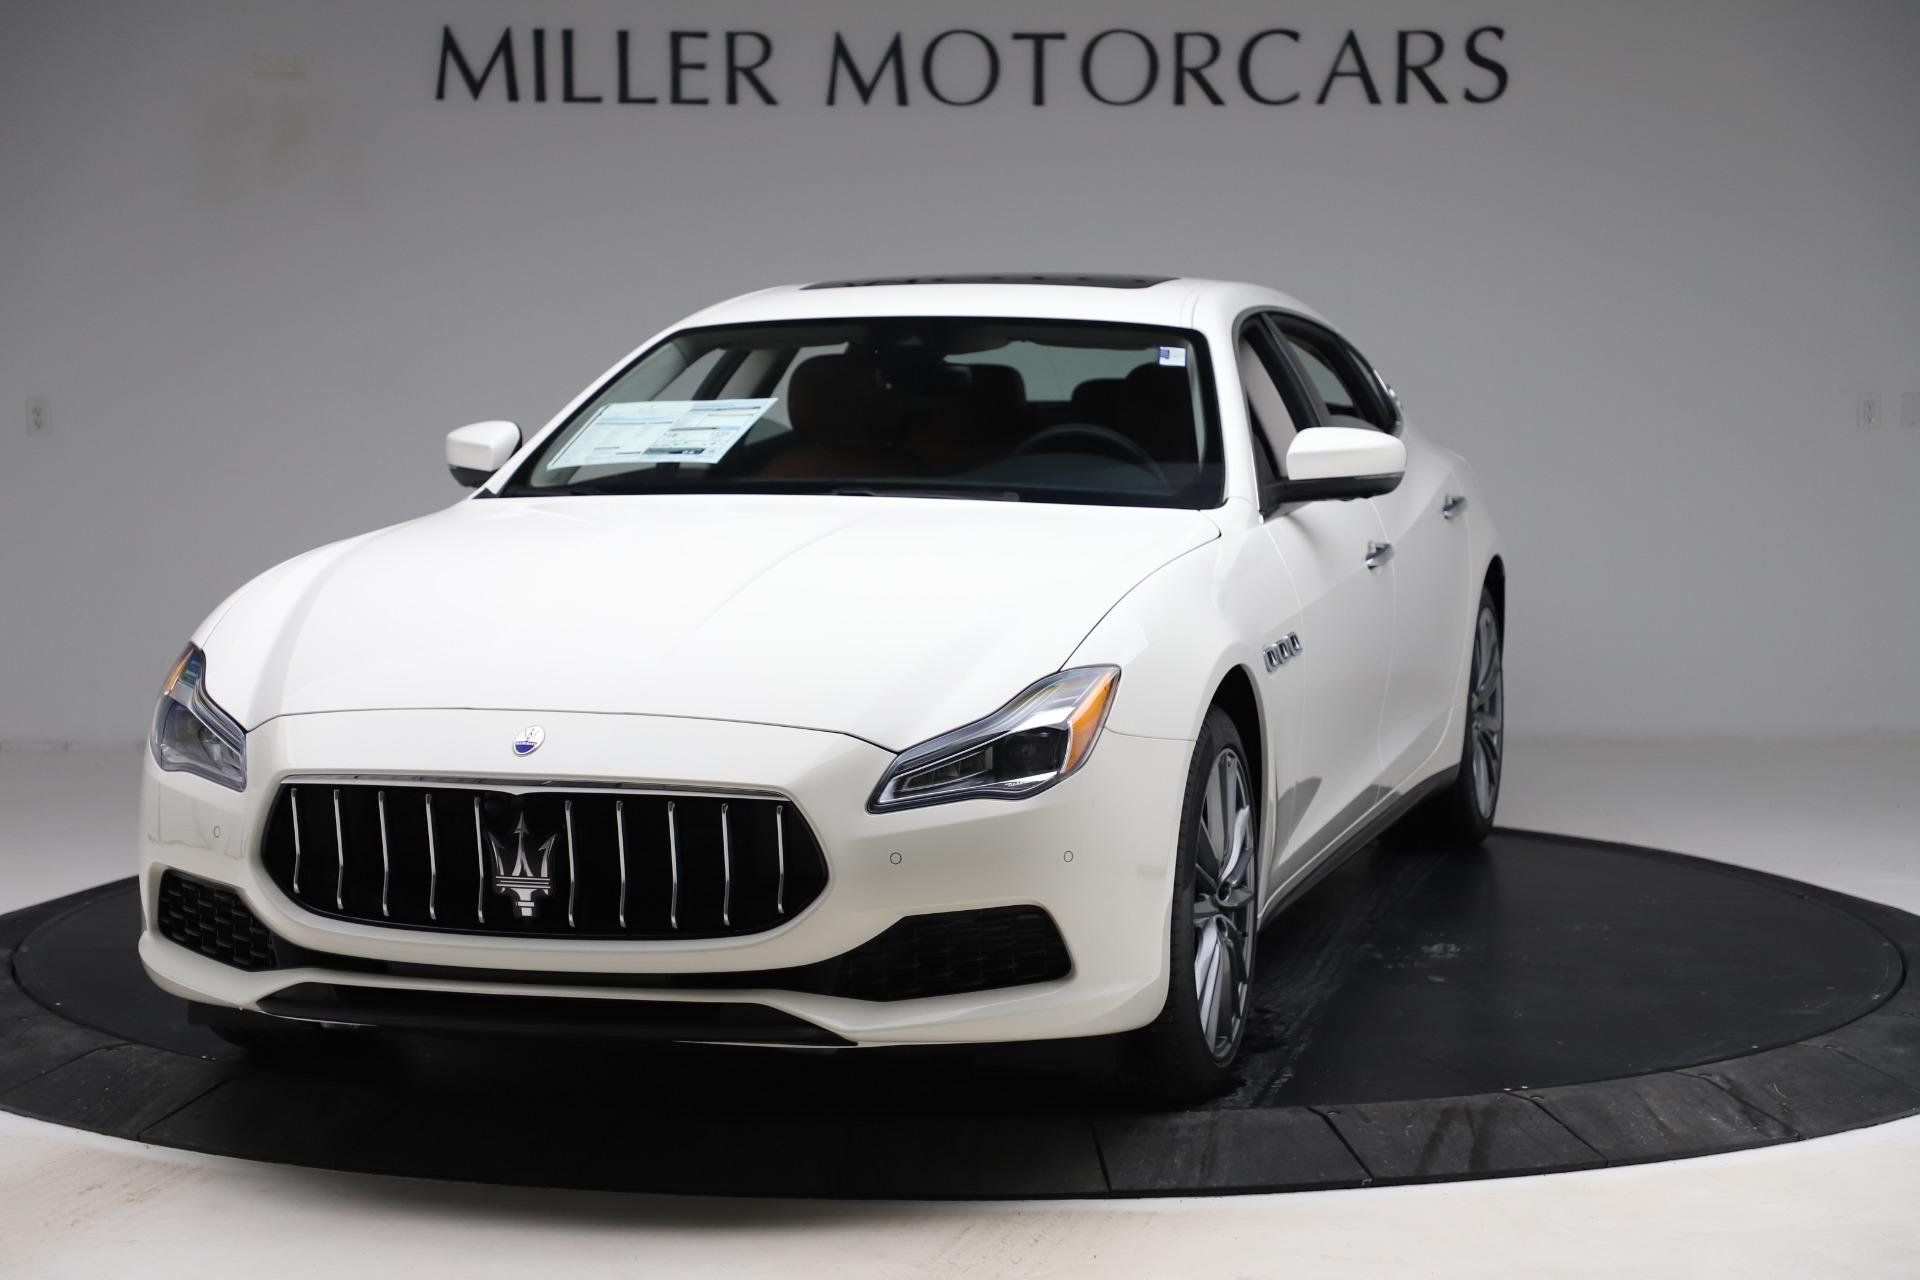 New 2019 Maserati Quattroporte S Q4 for sale $121,065 at Bentley Greenwich in Greenwich CT 06830 1